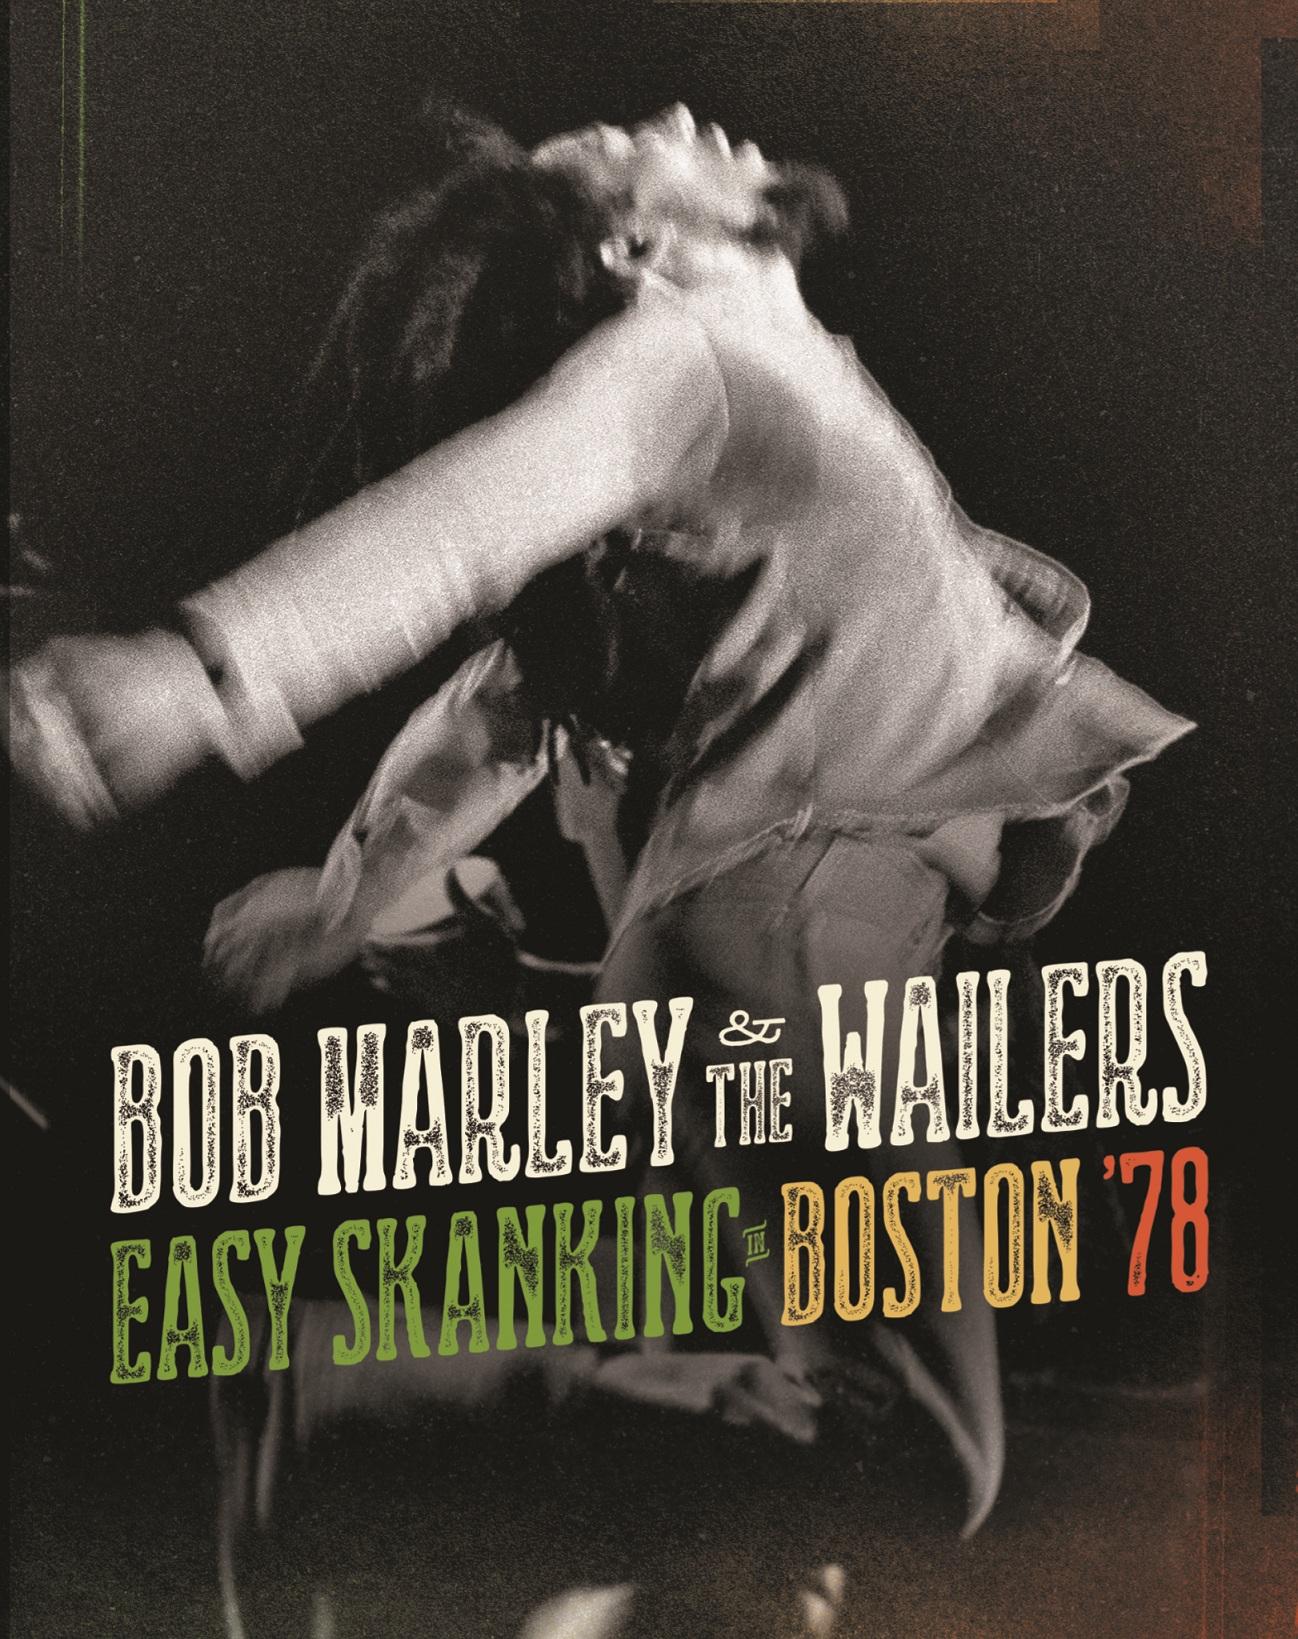 00602547165756 Bob Marley CD + DVD